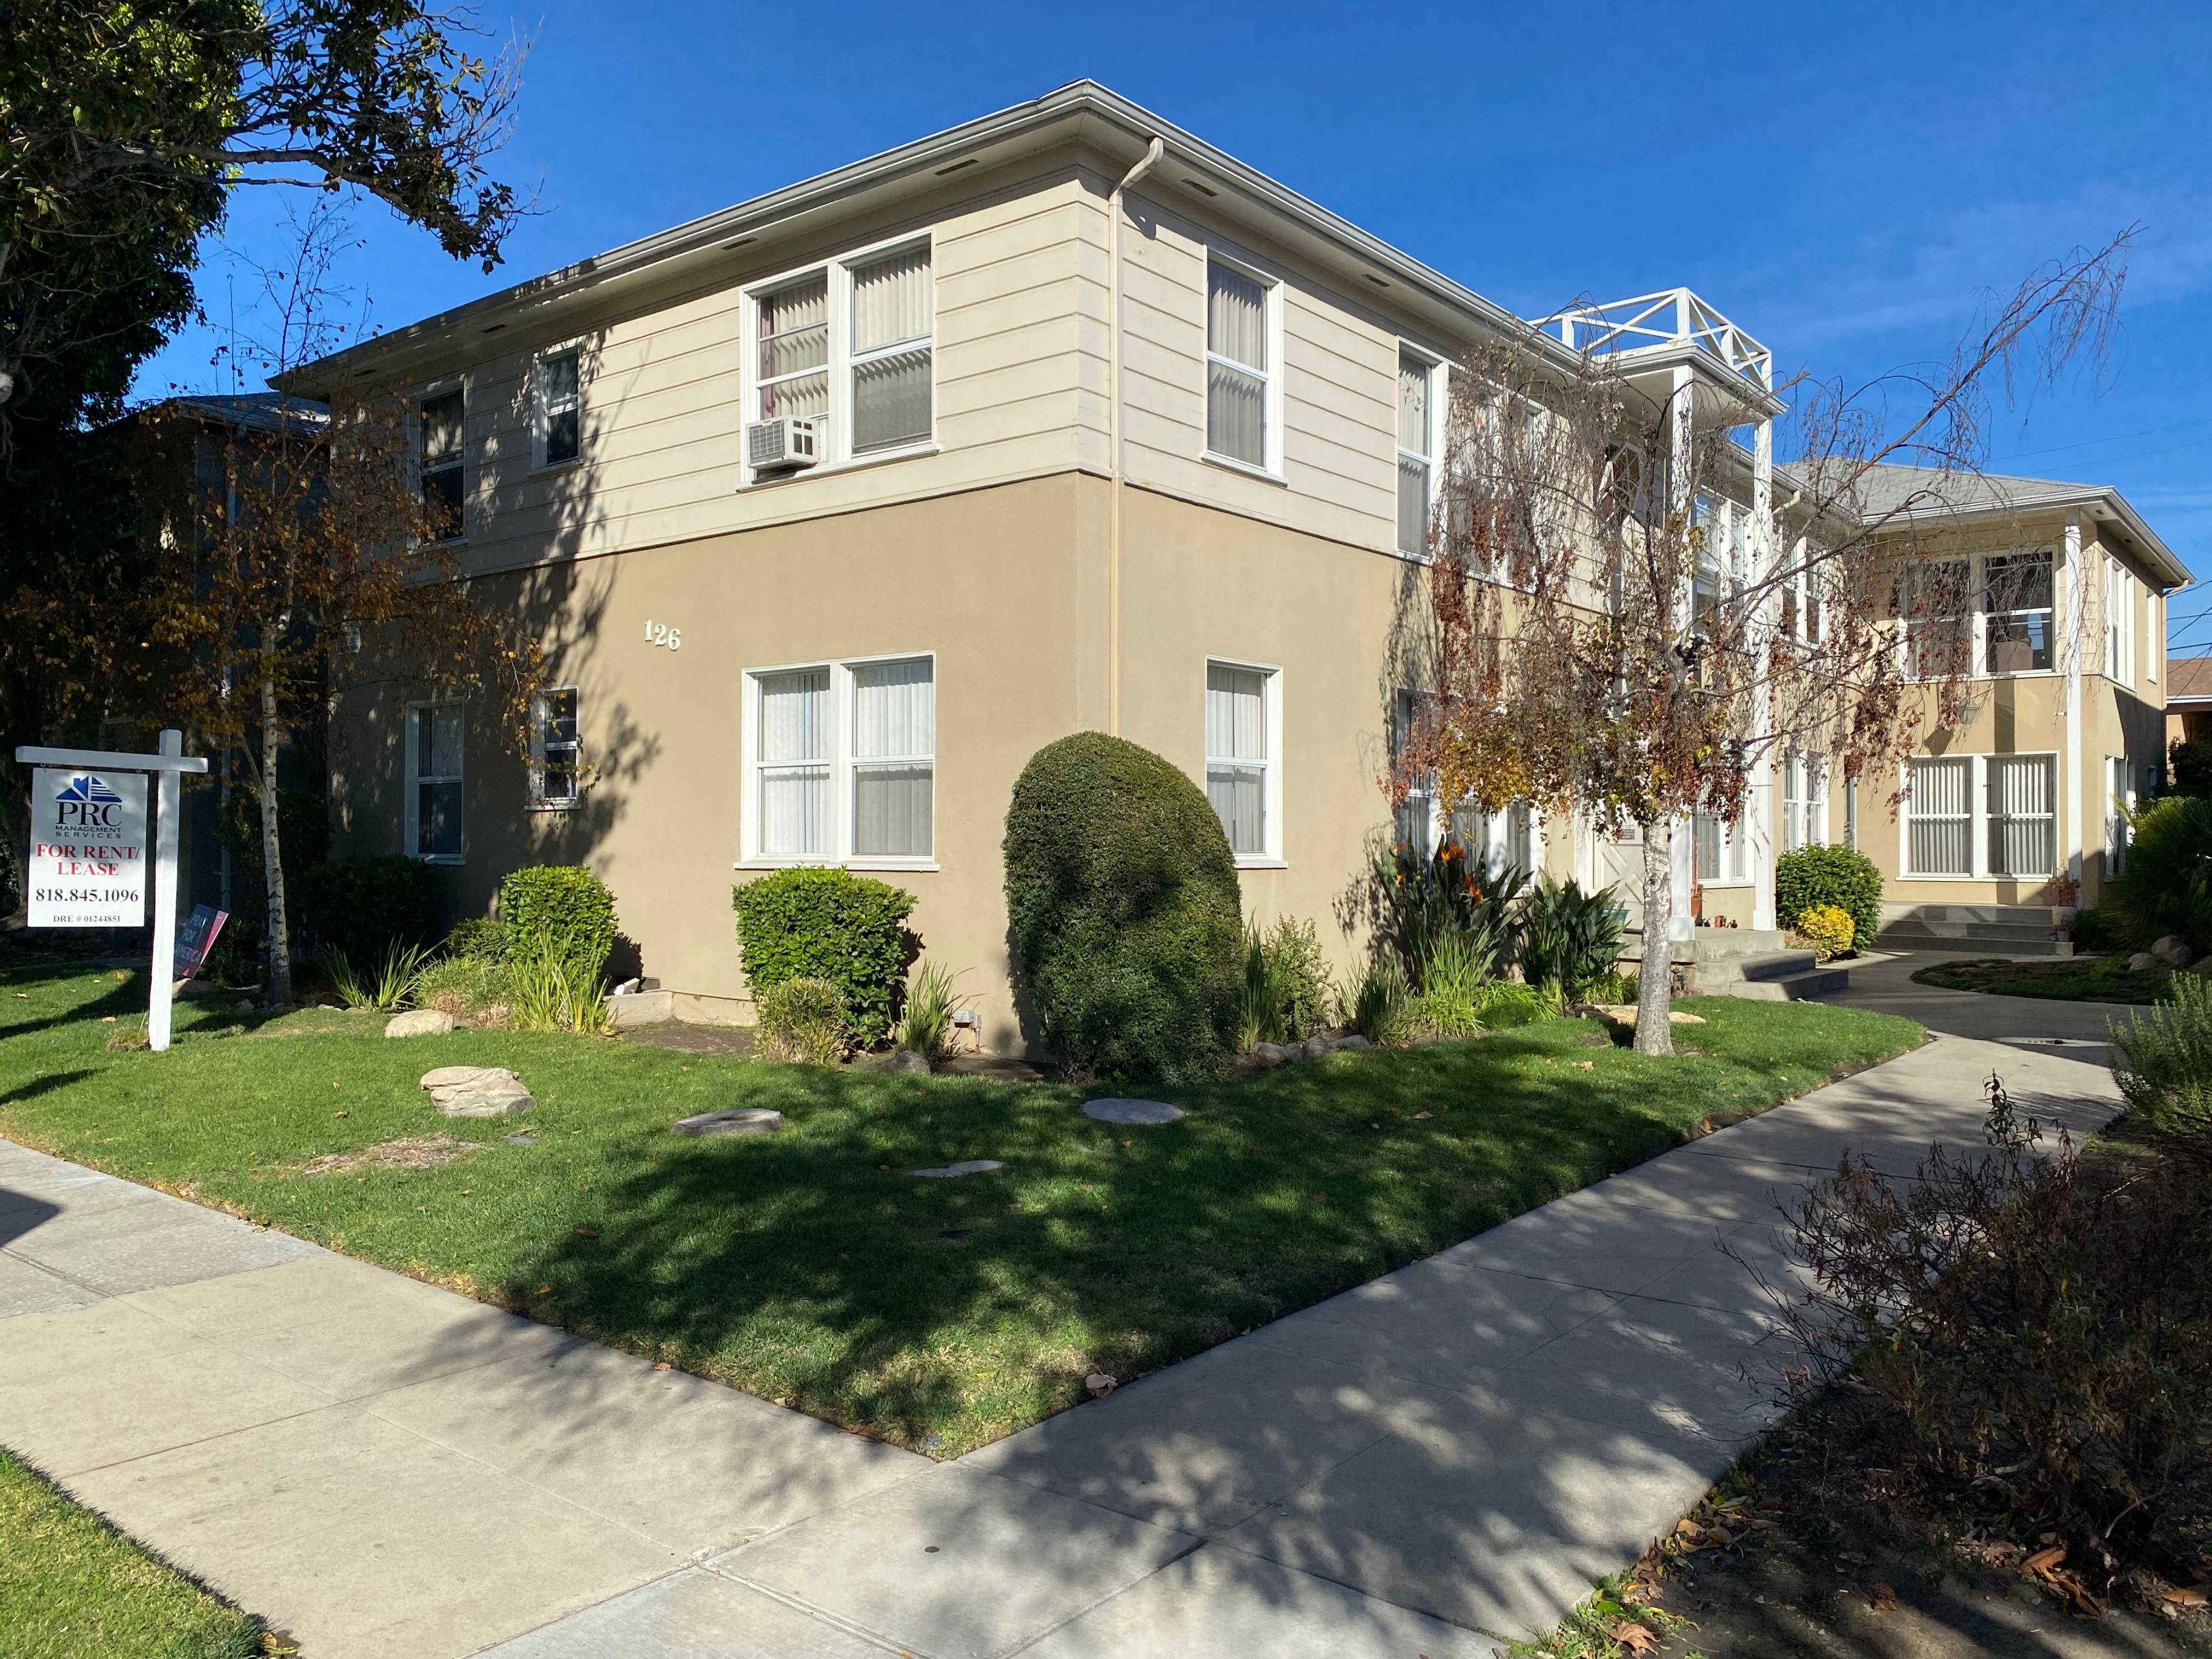 126 N. Lamer Street Burbank, CA 91506